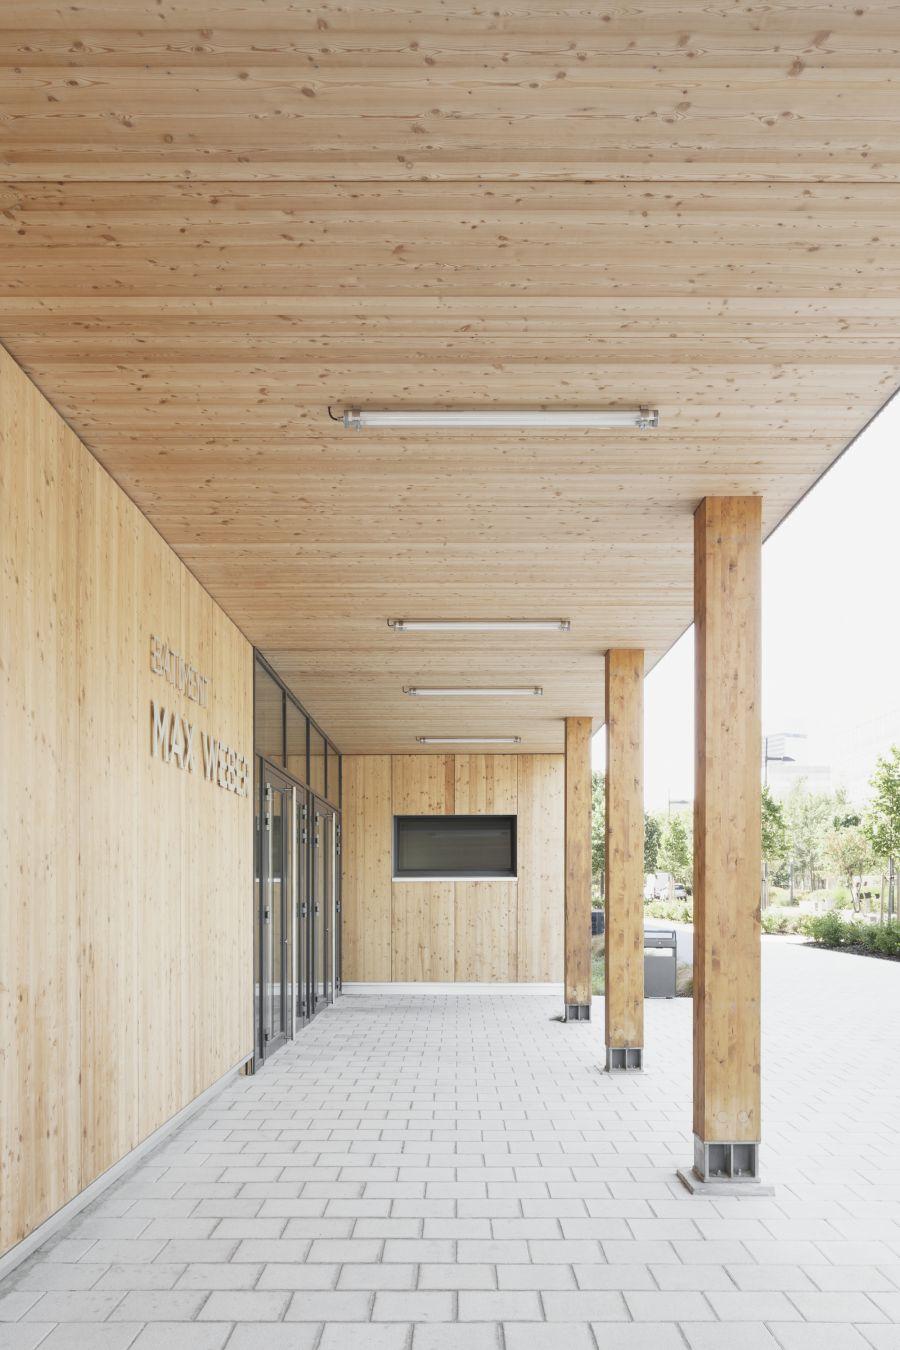 Bâtiment Max Weber - Arch. Pascal Gontier - Photo : Schnepp Renou, Hervé Abbadie